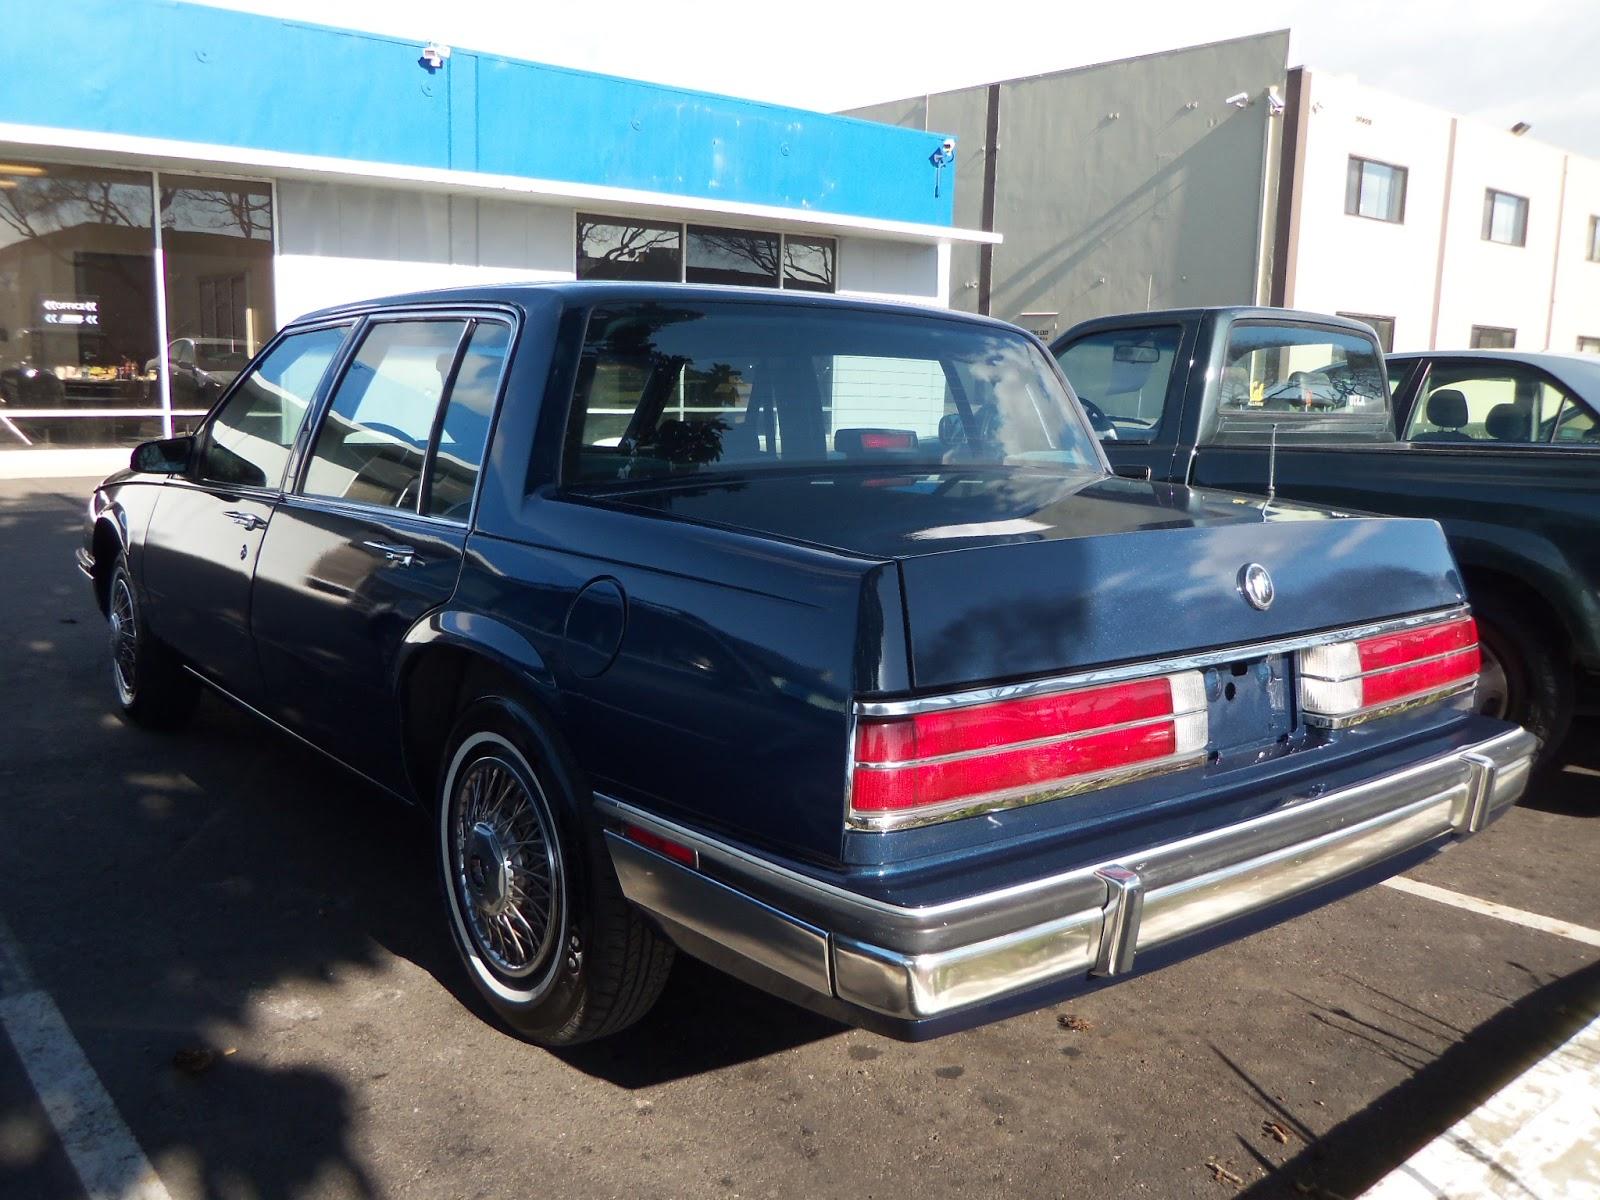 Buick Repair Fremont >> Auto Body-Collision Repair-Car Paint in Fremont-Hayward-Union City-San Francisco Bay: 1989 Buick ...